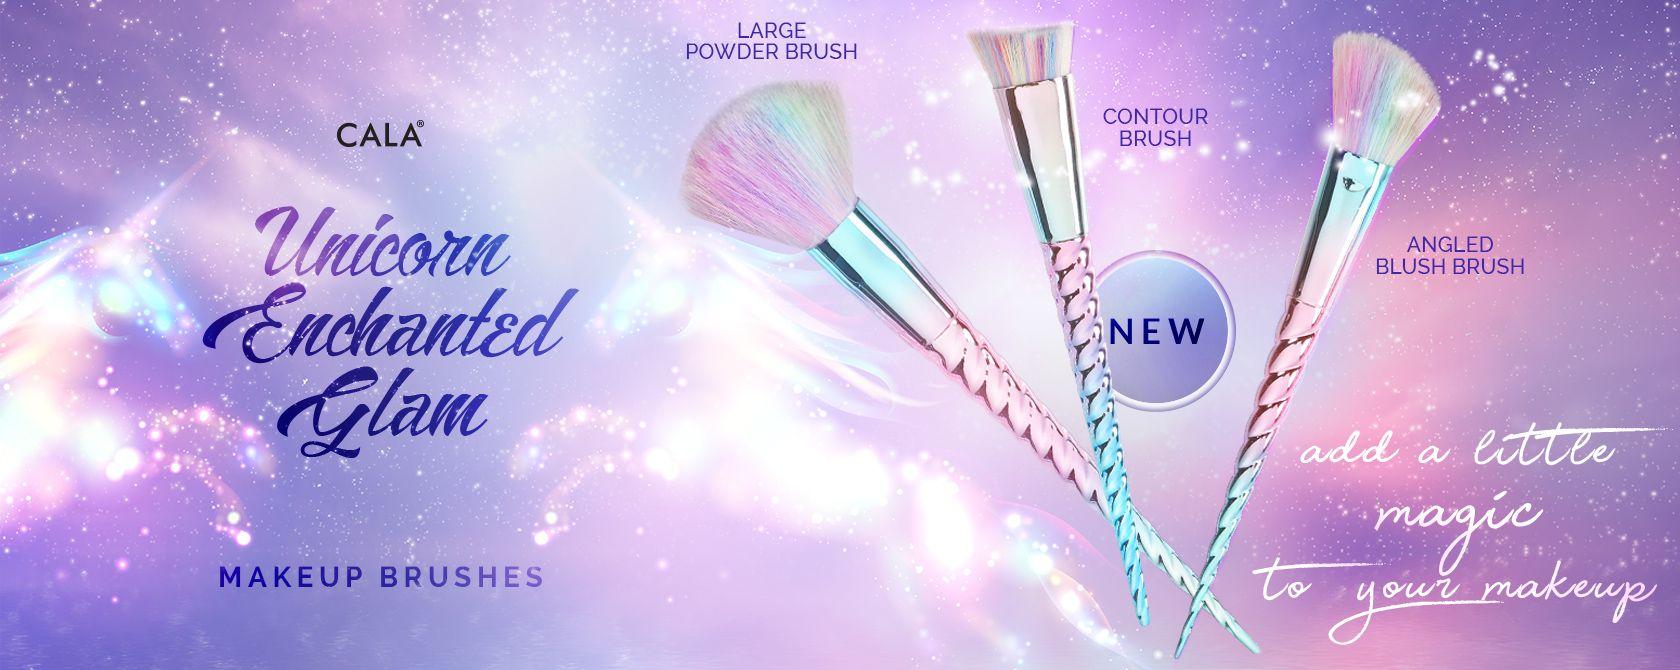 Alexandar Cosmetics Team